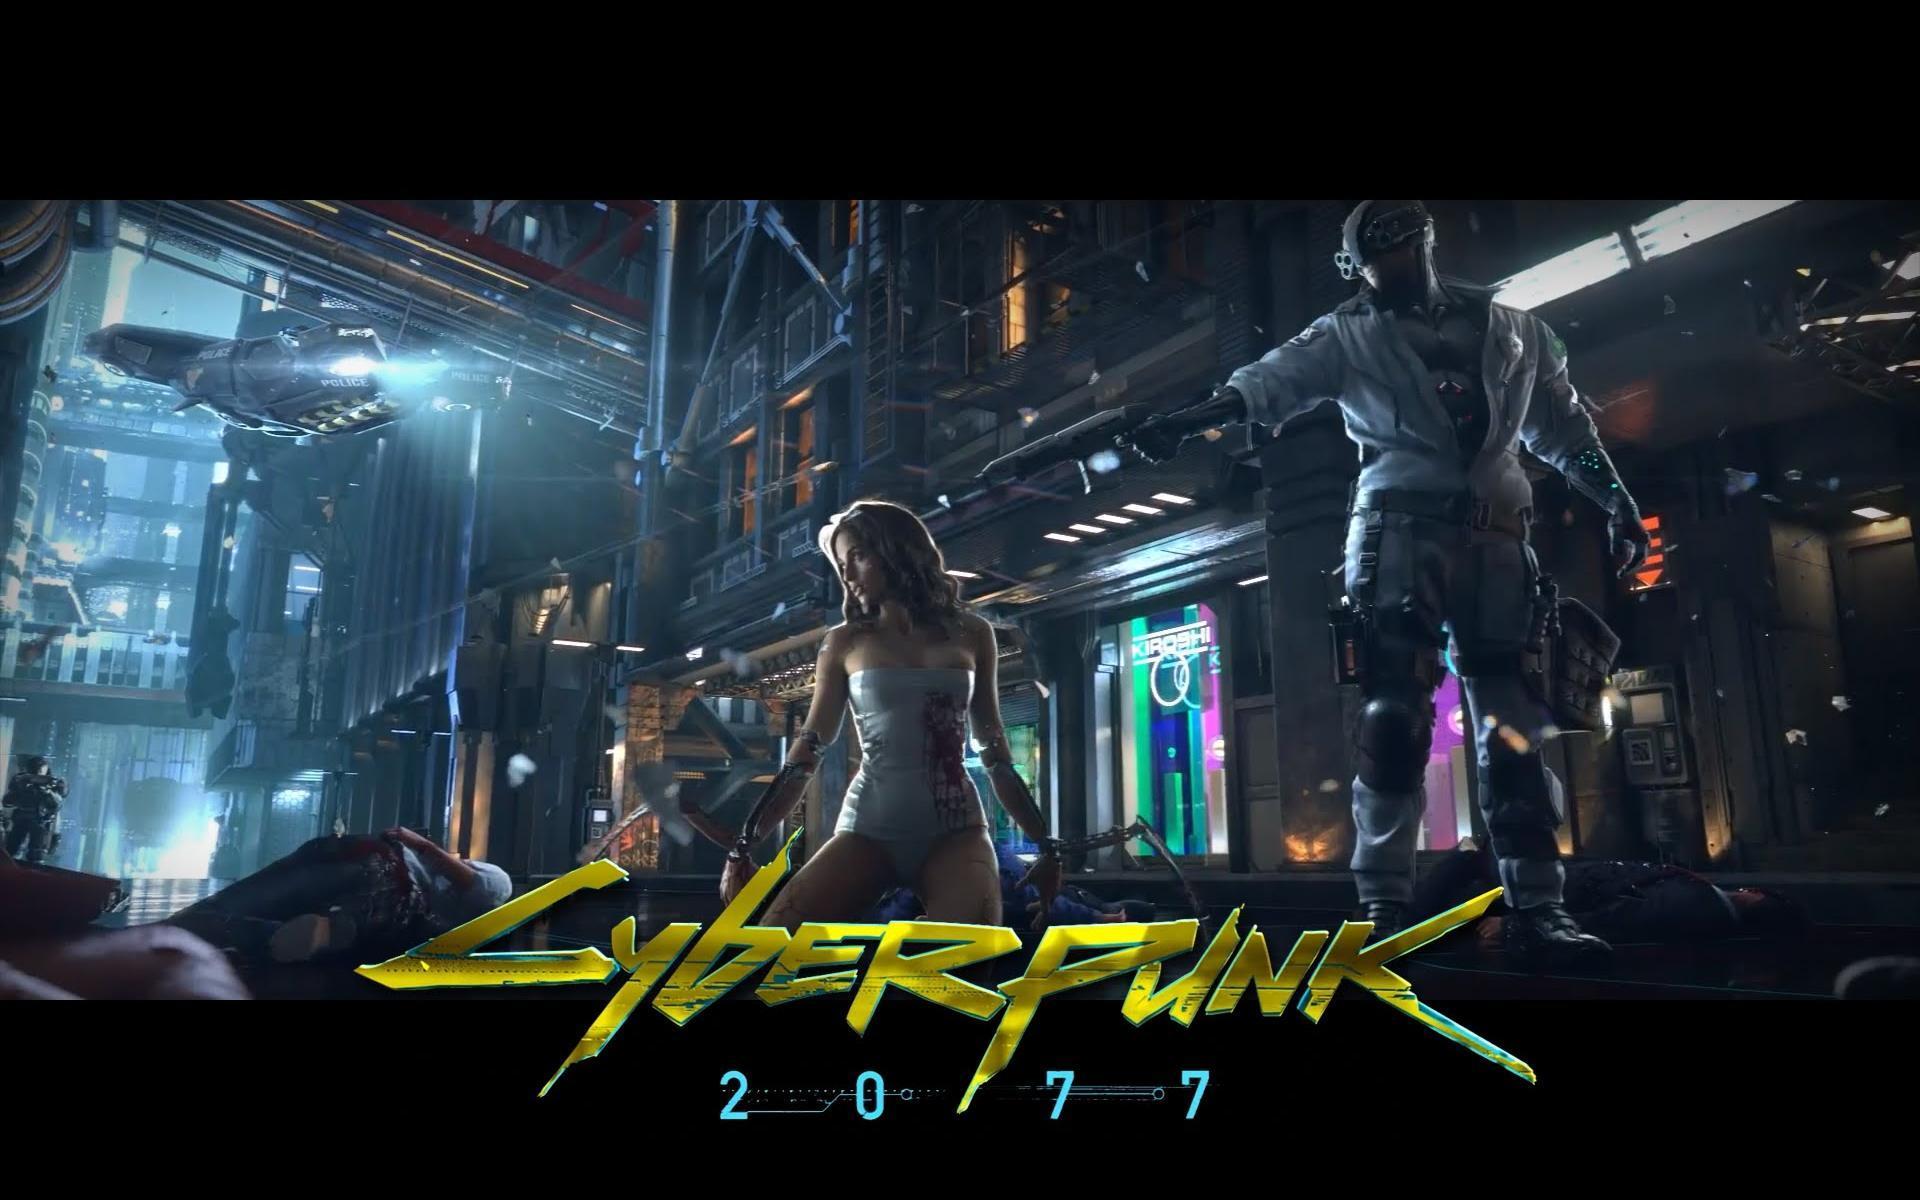 Cyberpunk 2077 Full Hd Wallpapers Hd Wallpaper Cave